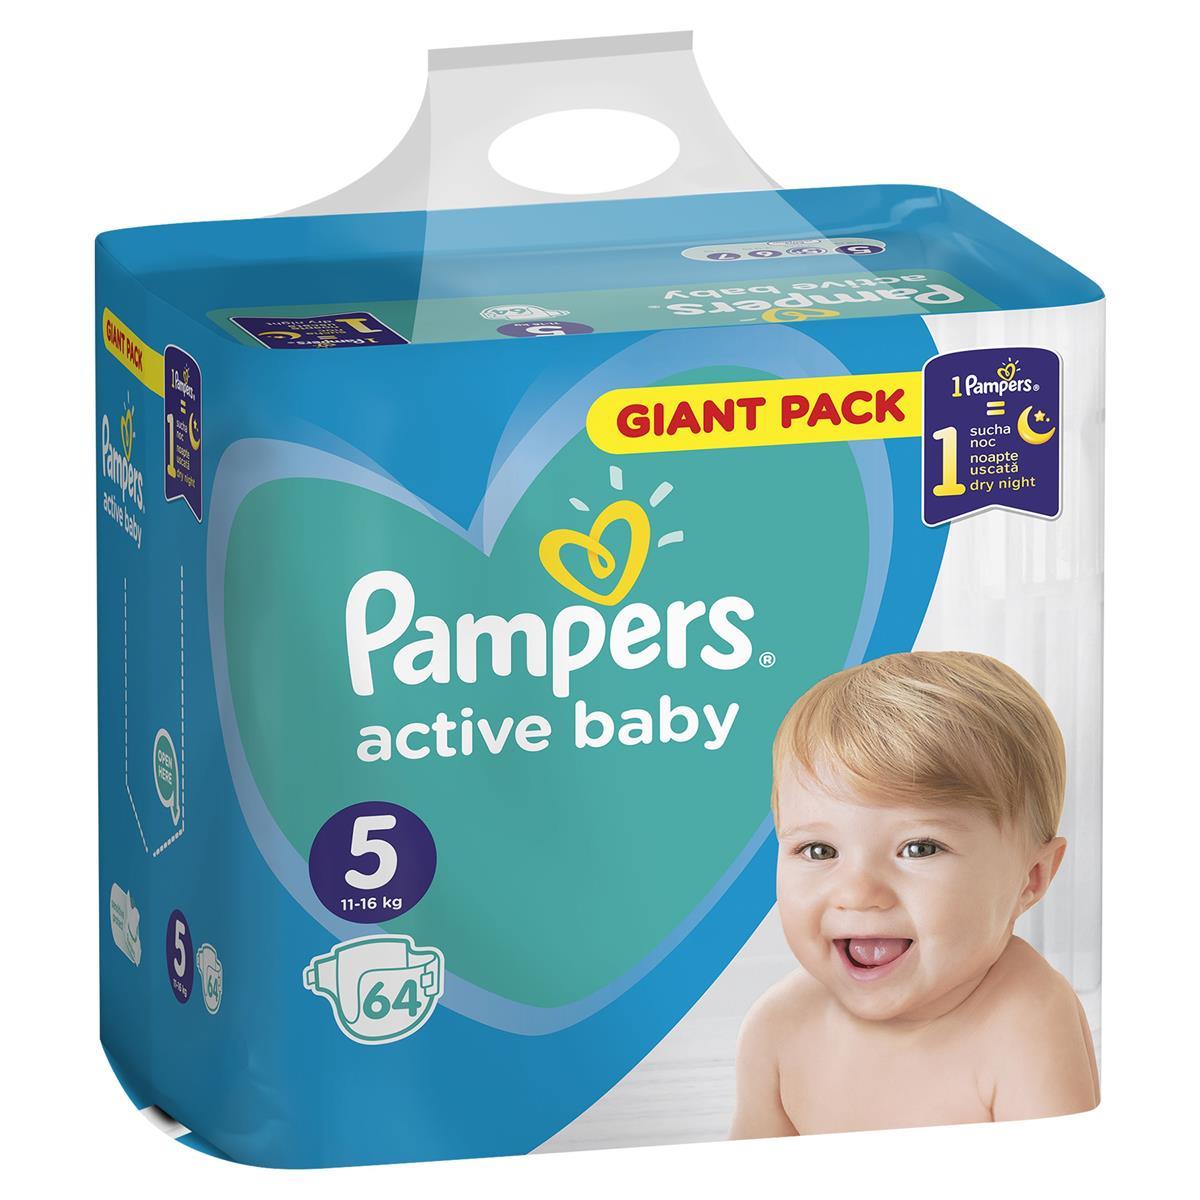 Pampers active baby  Junior 64ks plenkové kalhotky 11-16kg